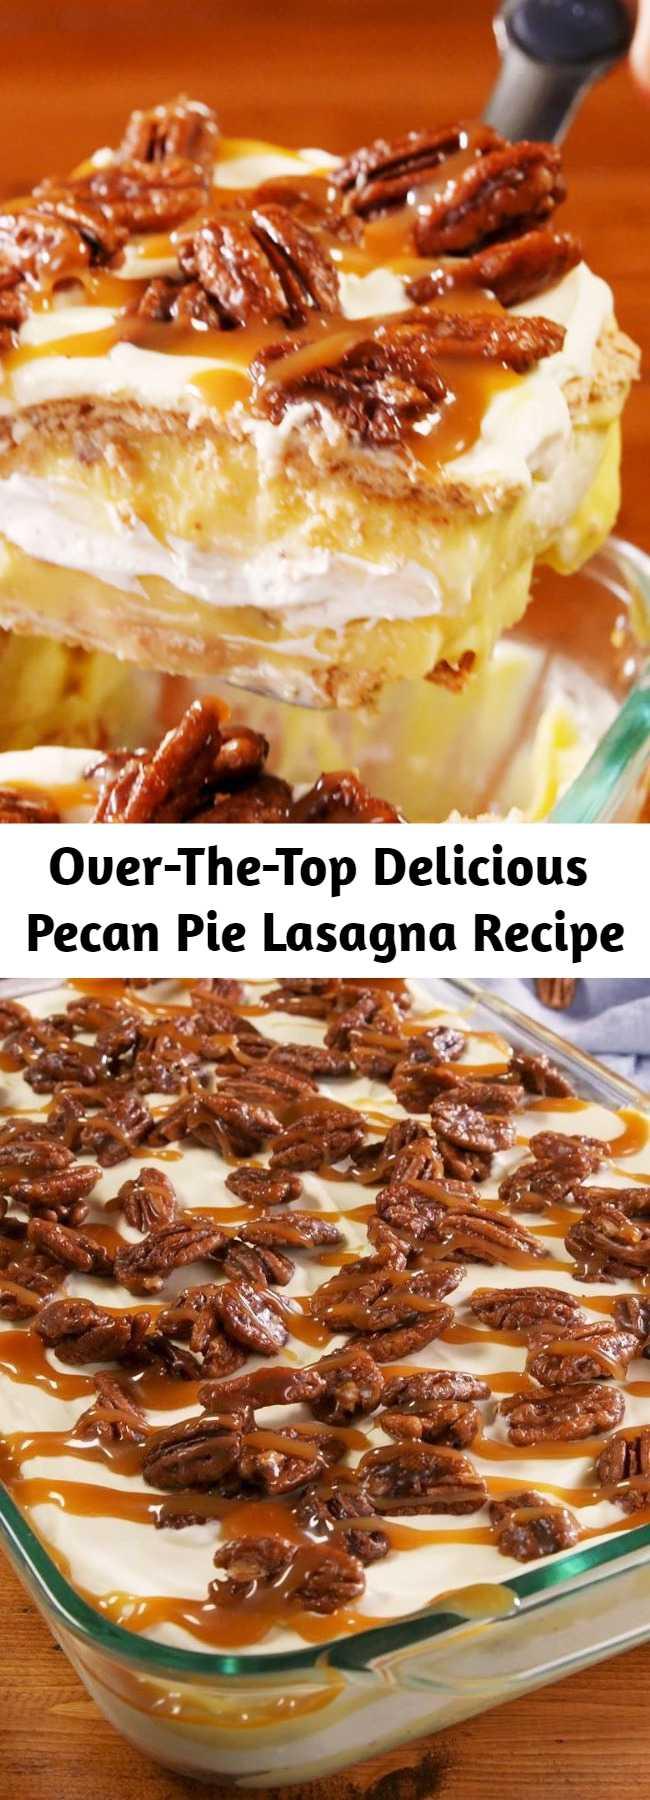 Over-The-Top Delicious Pecan Pie Lasagna Recipe - This Pecan Pie Lasagna is the ultimate layered fall dessert.